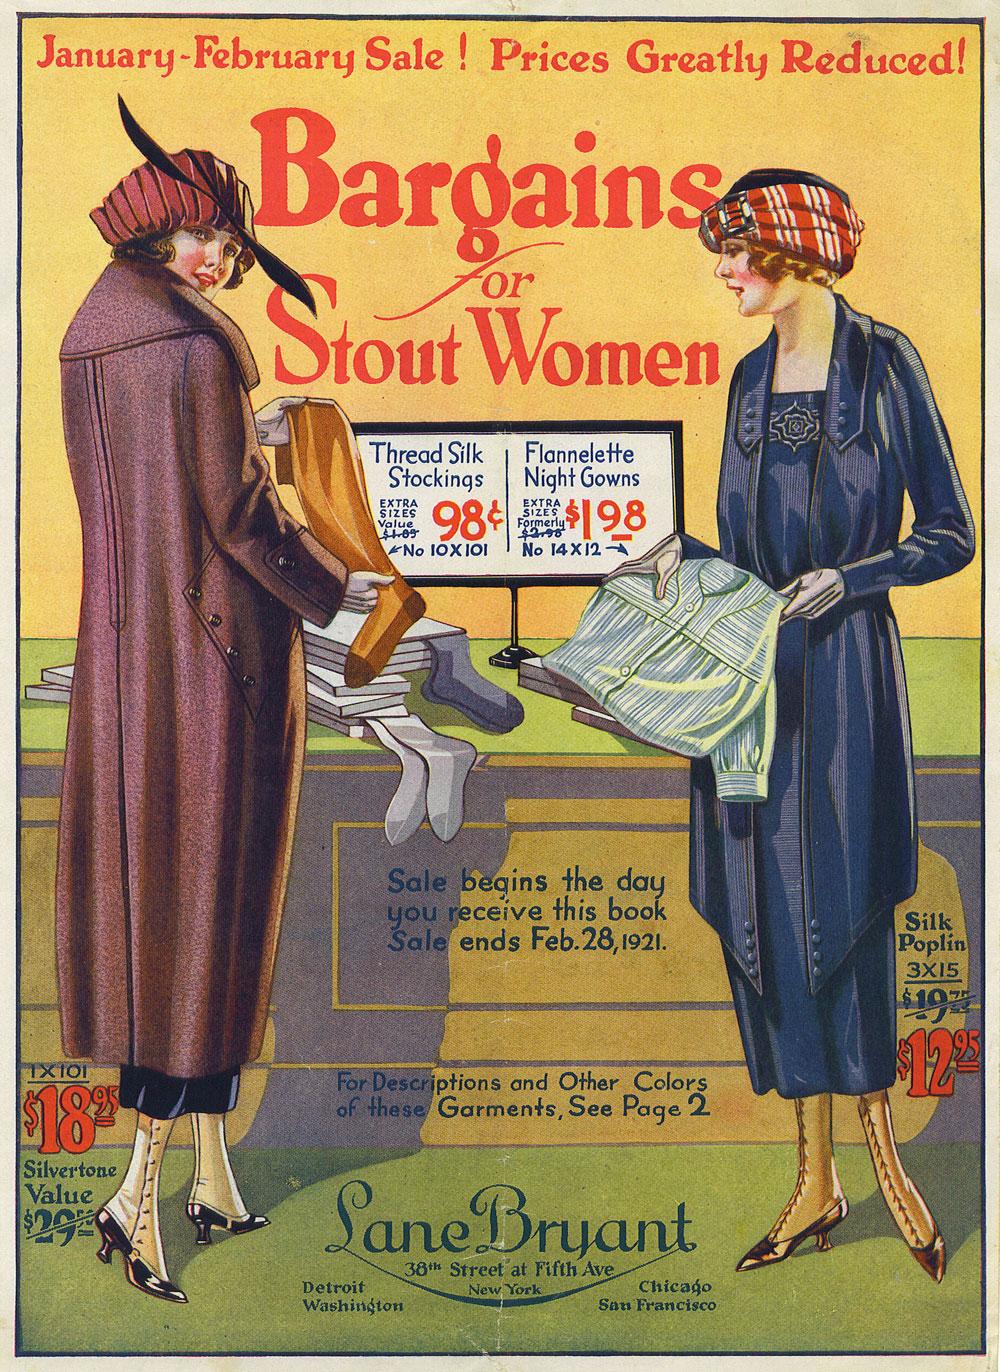 A 1921 ad by Lane Bryant